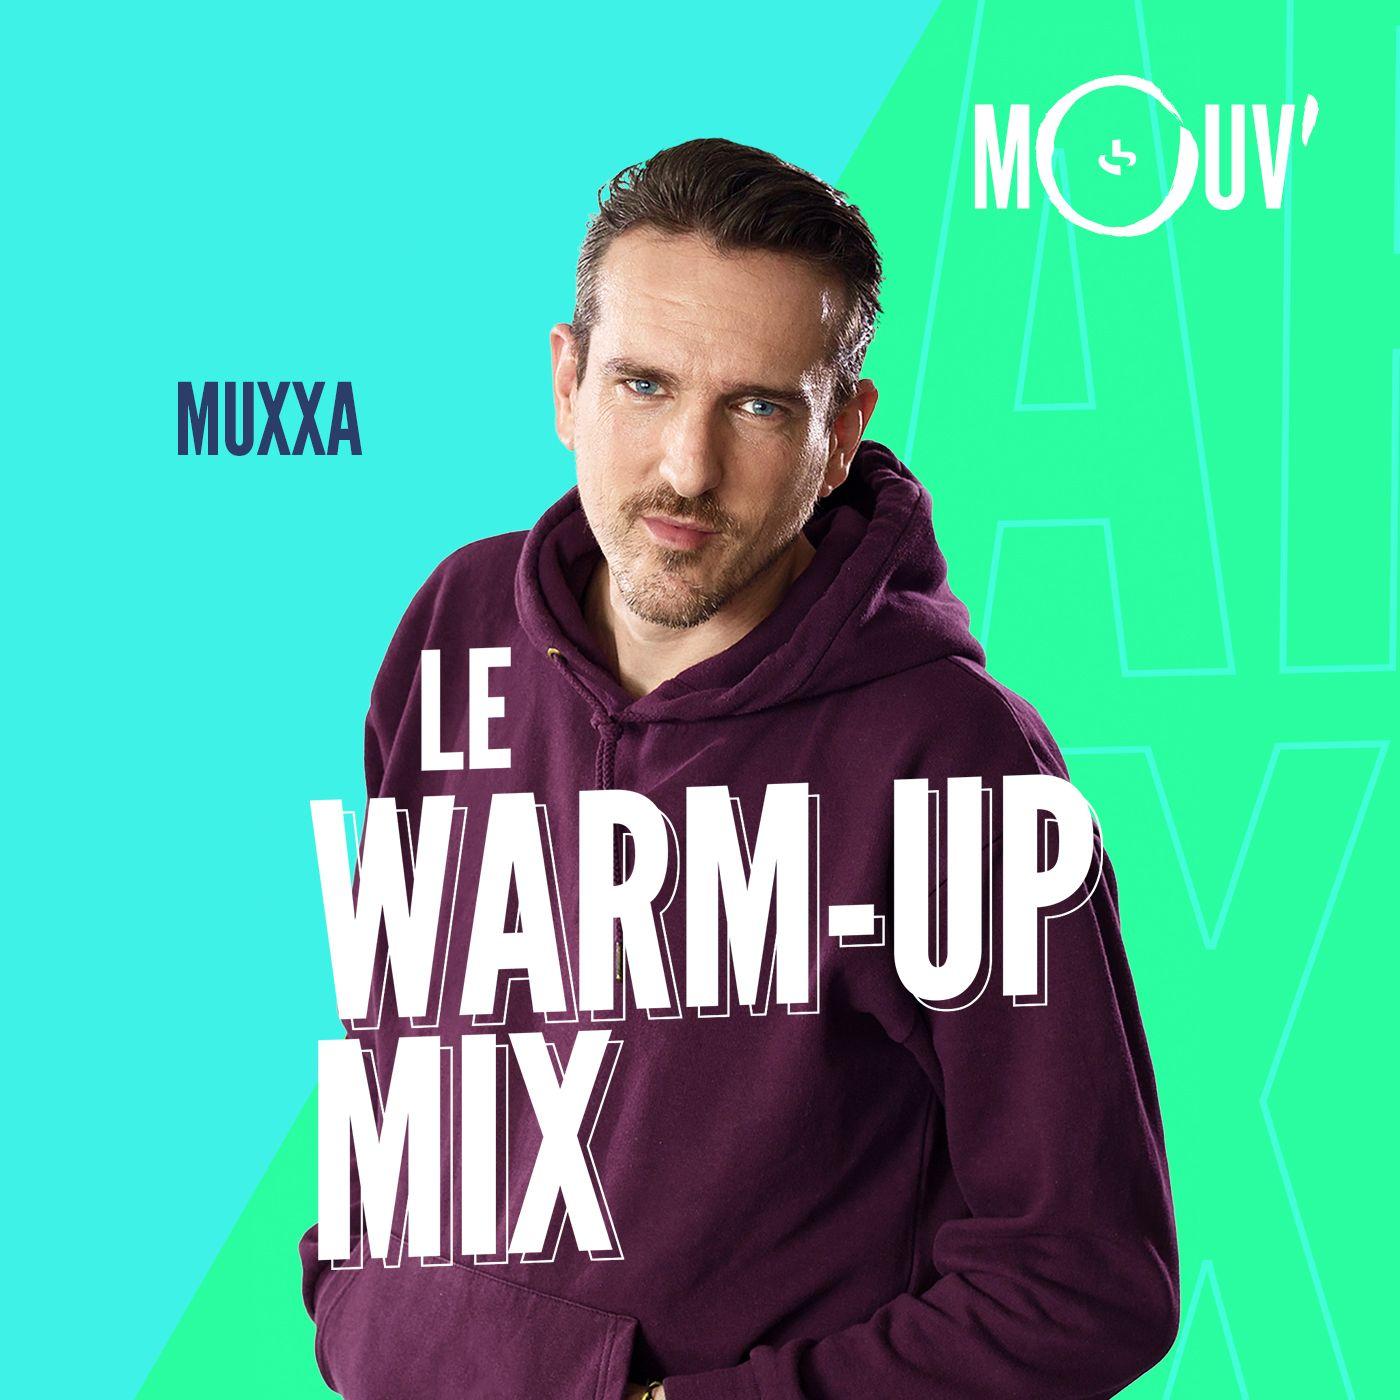 Image 1: Le Warm up Mix